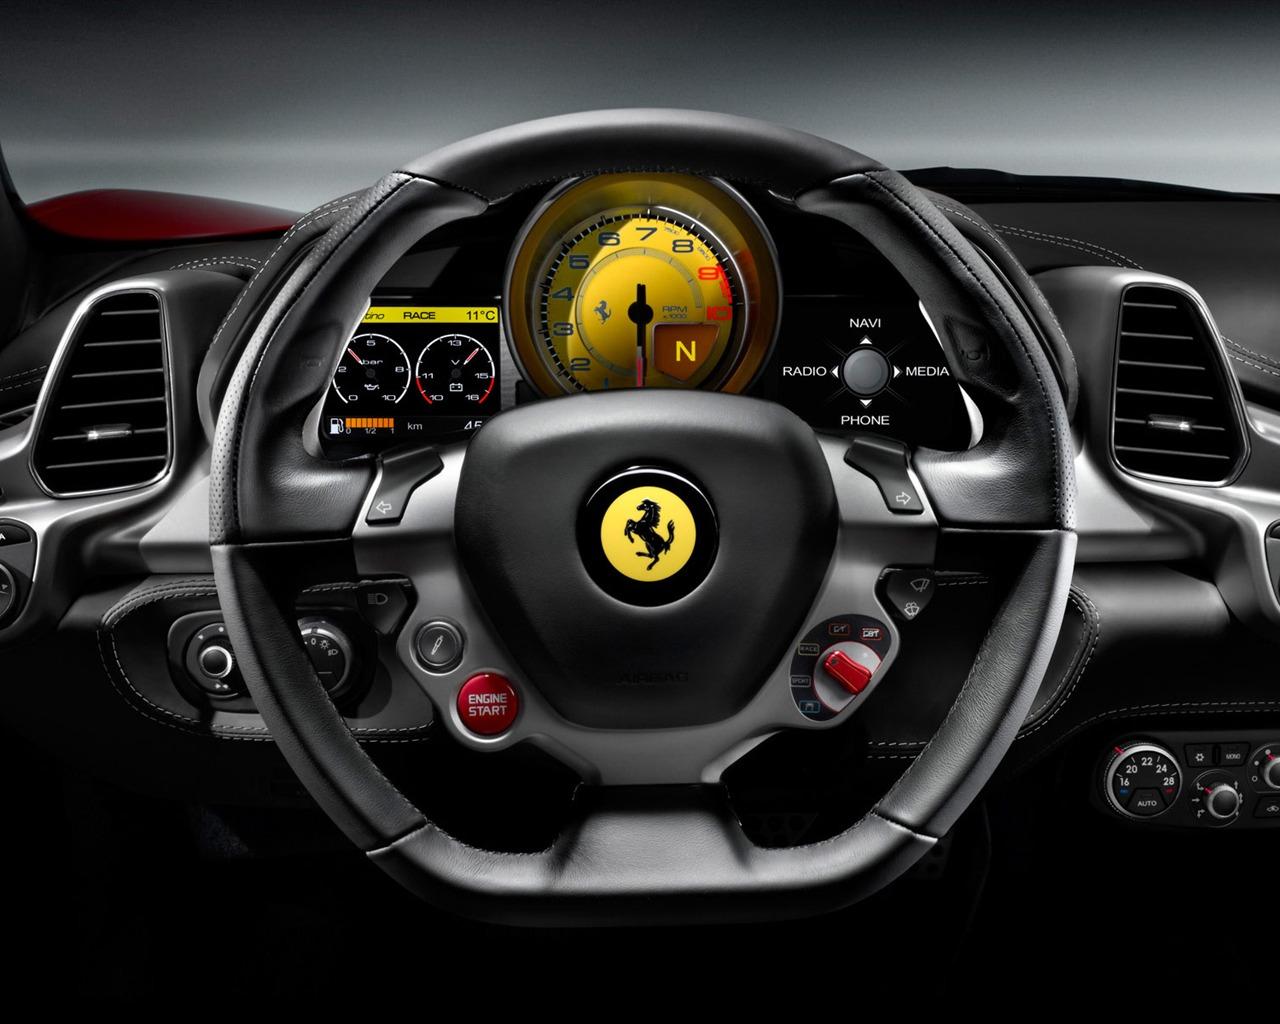 Ferrari Italia 458 >> 方向盘-法拉利458系列顶级跑车壁纸预览 | 10wallpaper.com